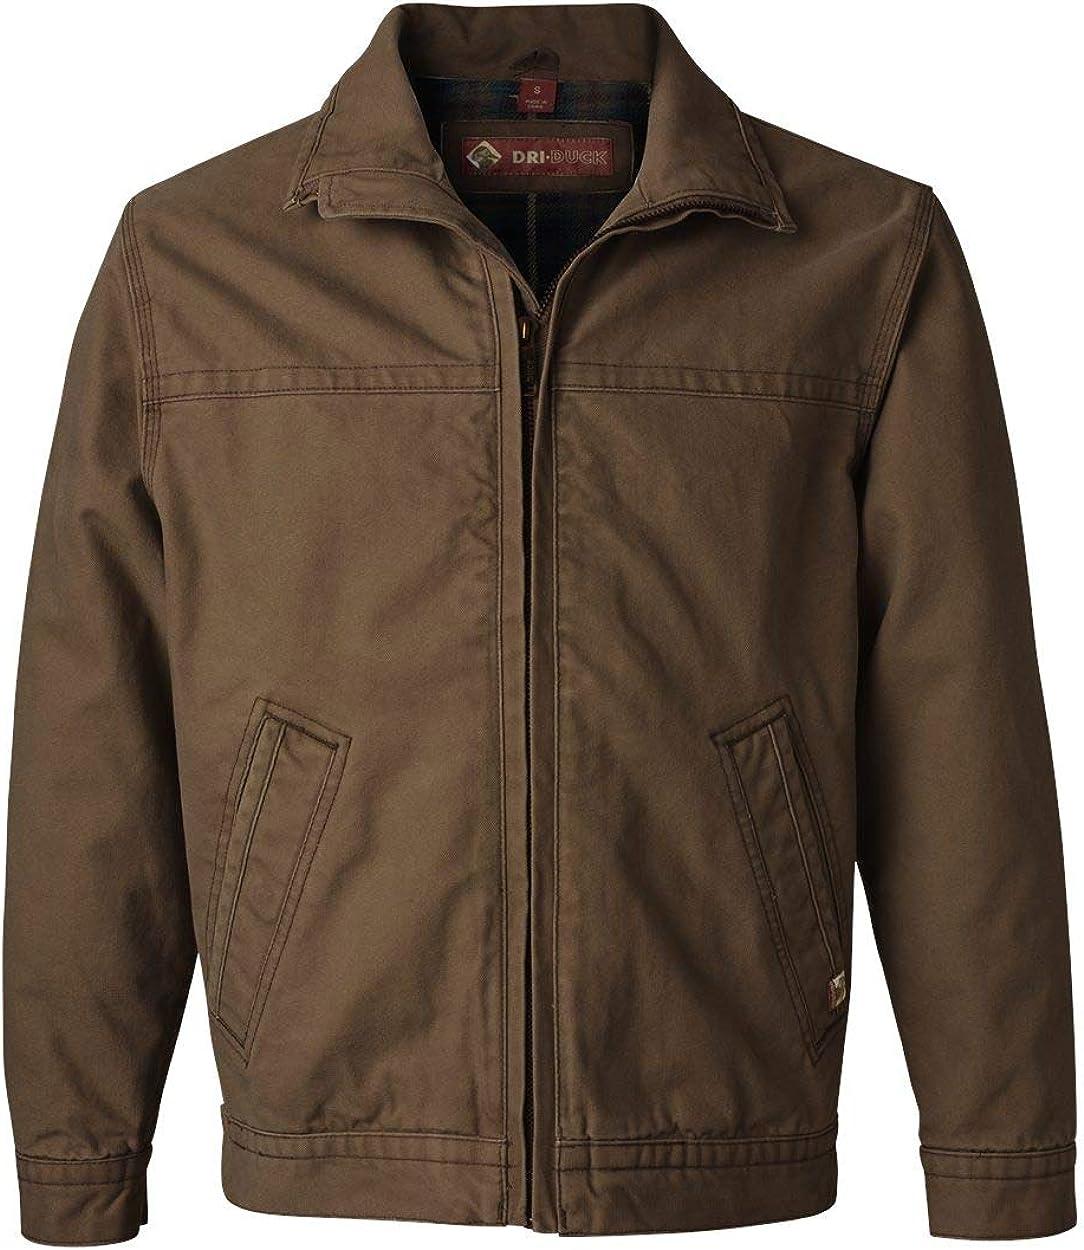 DRI Duck Maverick Blanket Lined Jacket Mens